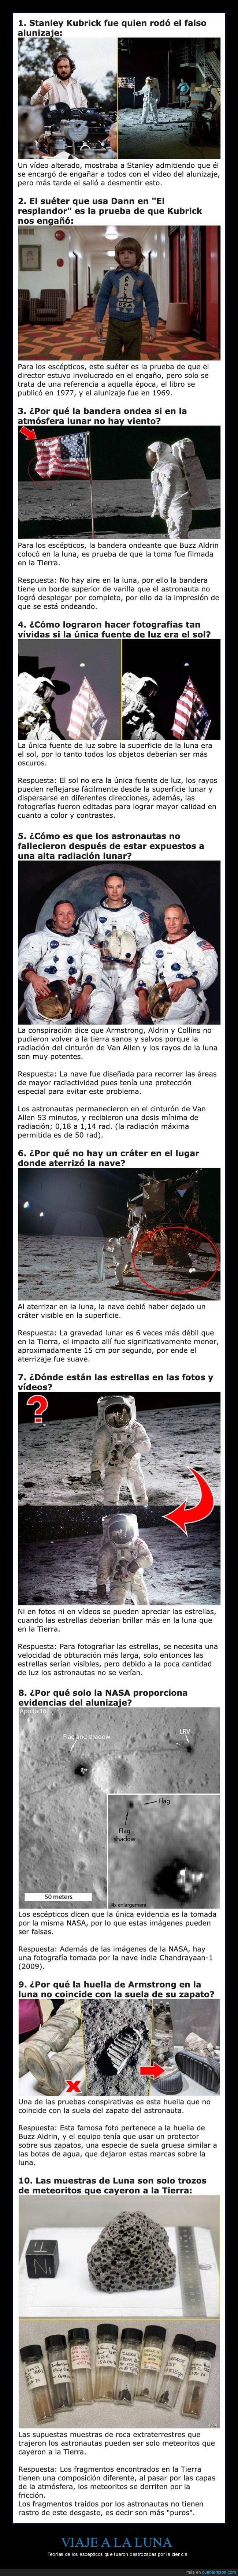 alunizaaje,escépticos,luna,teorías